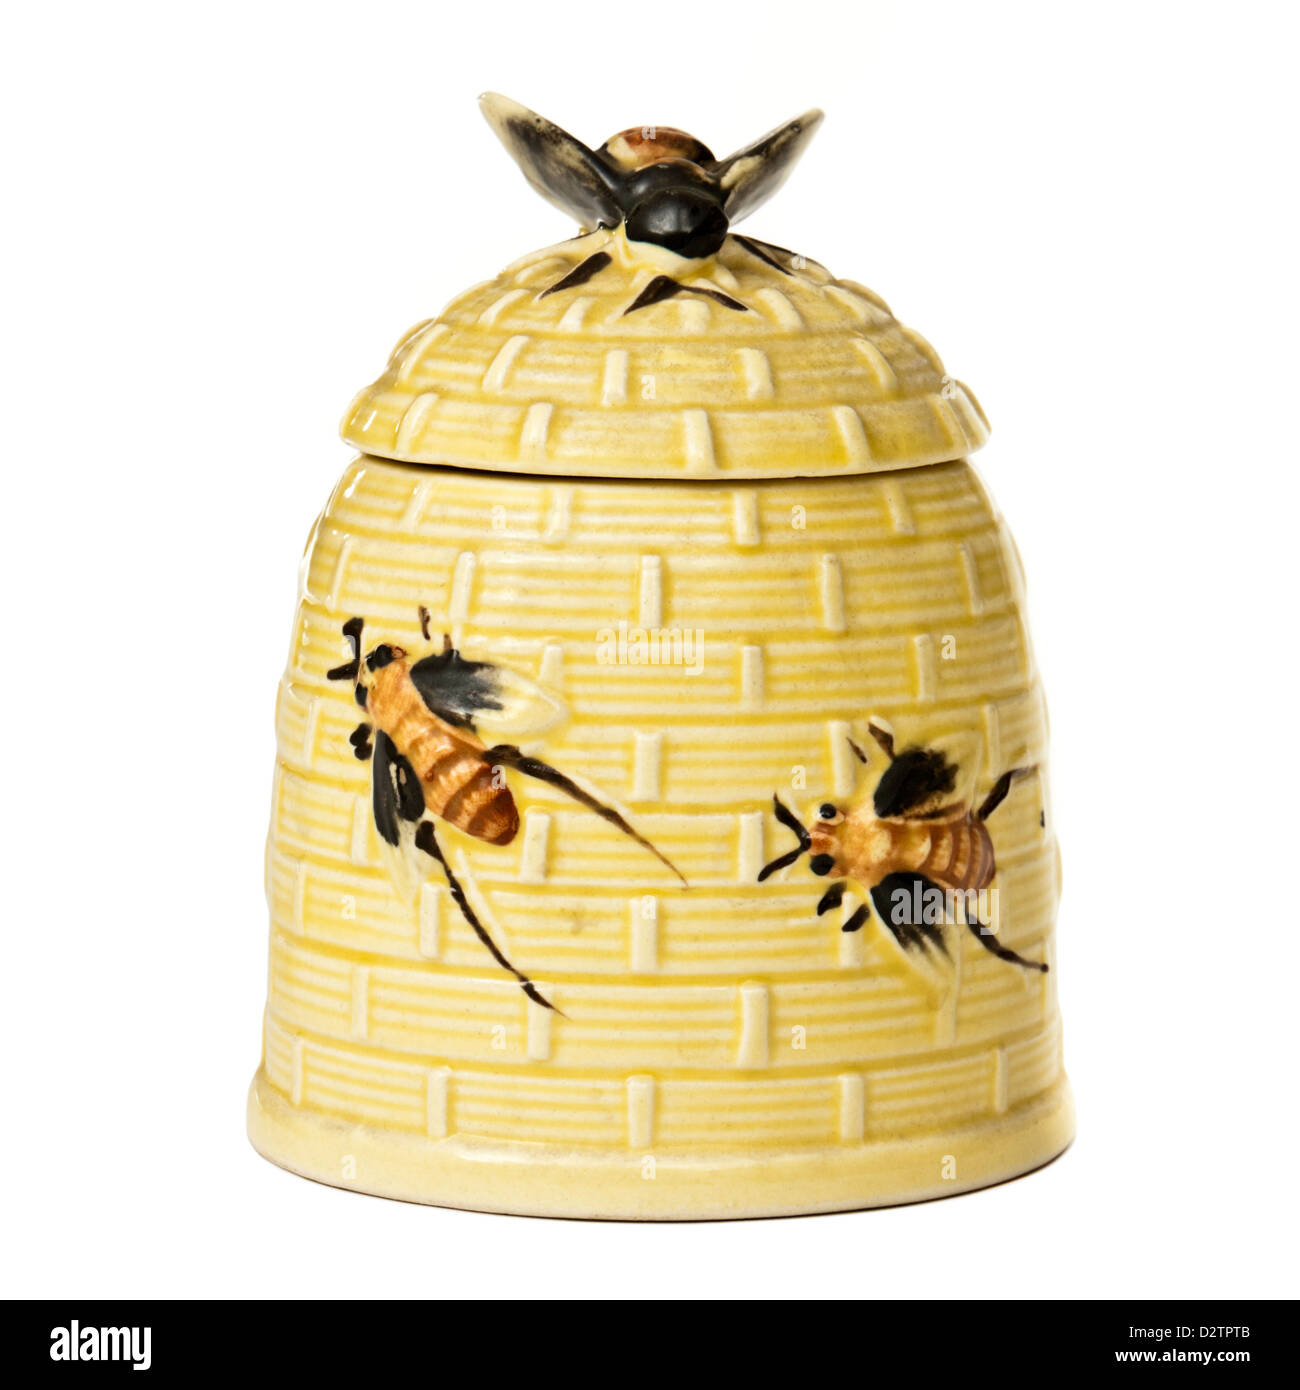 Vintage porcelain beehive-shaped honey pot - Stock Image